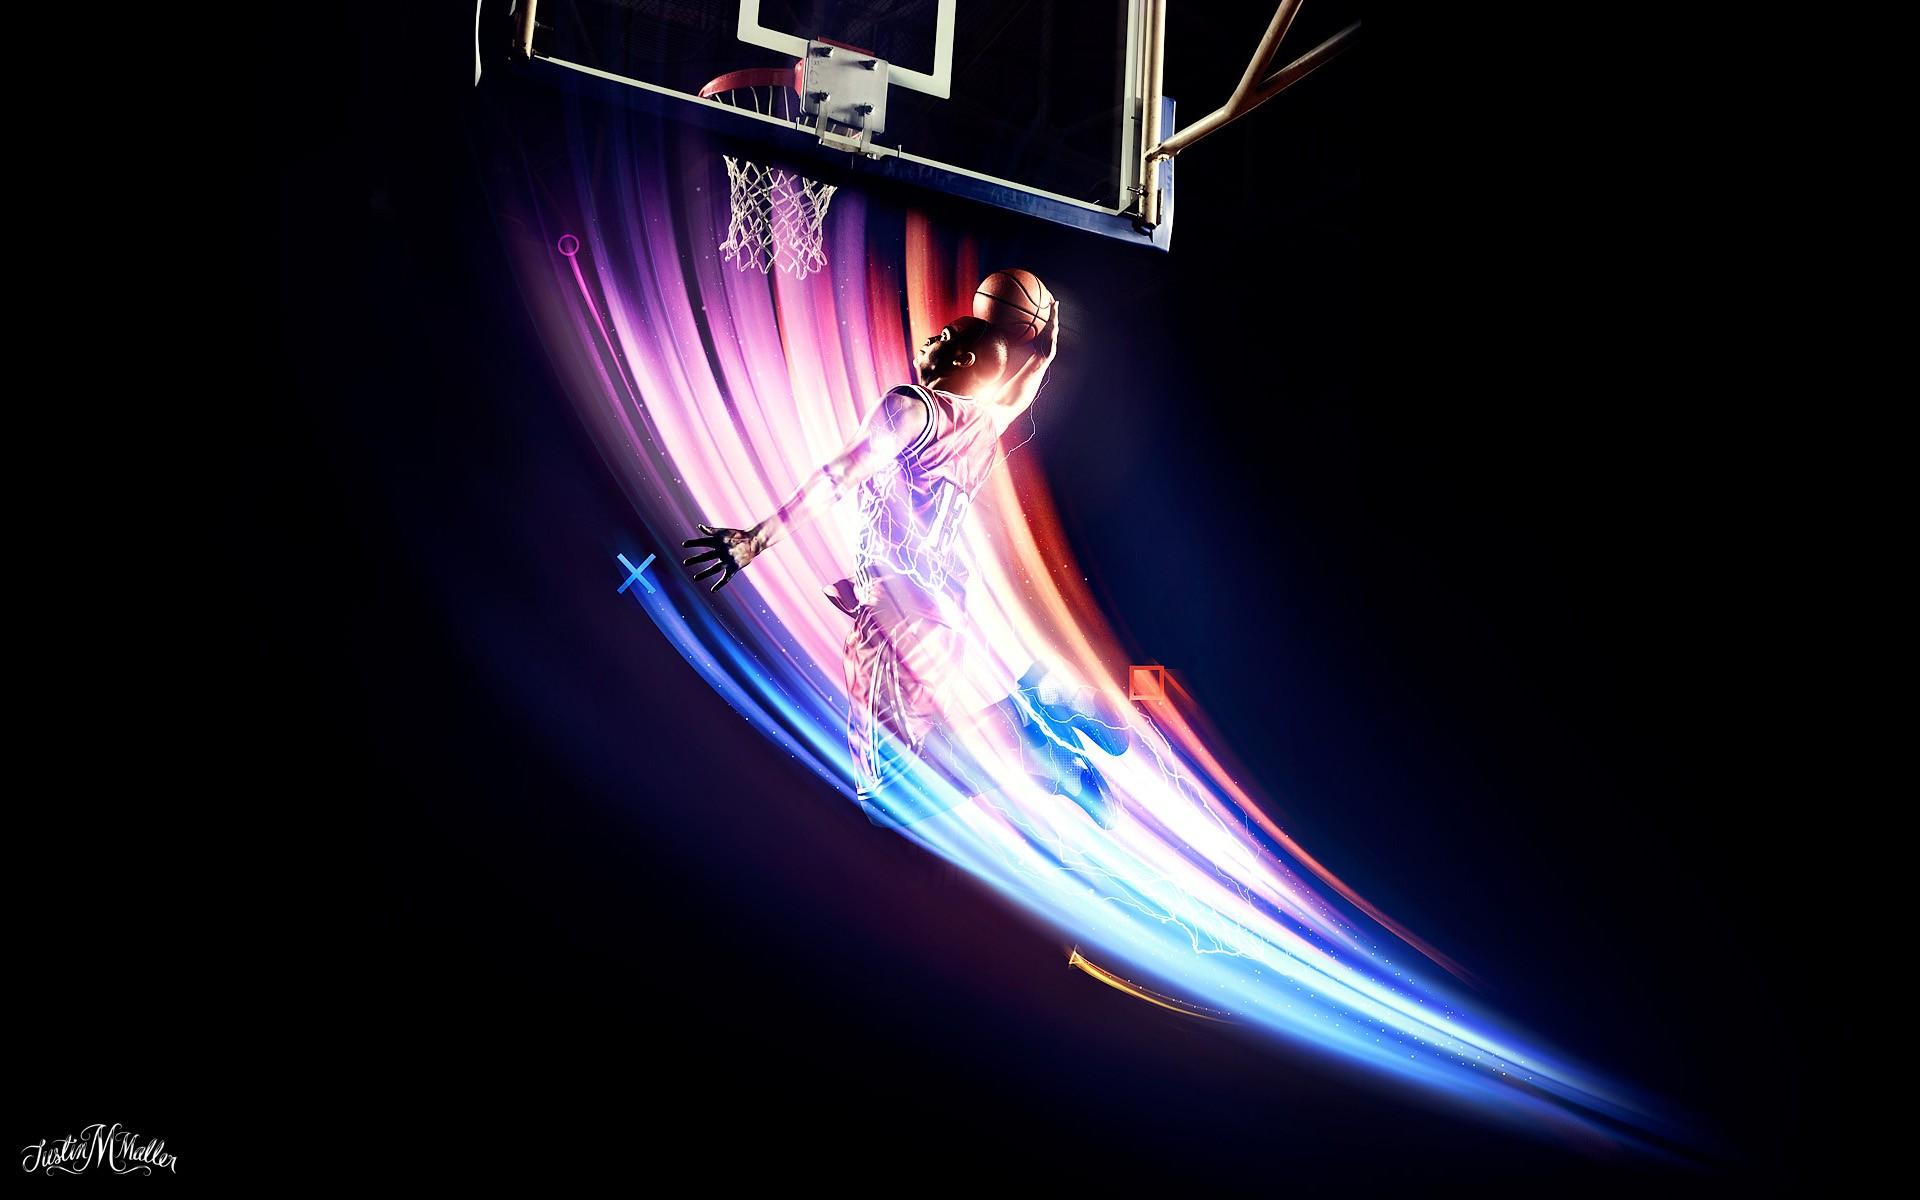 Wallpaper Sports Night Neon Space Circle Basketball Nba